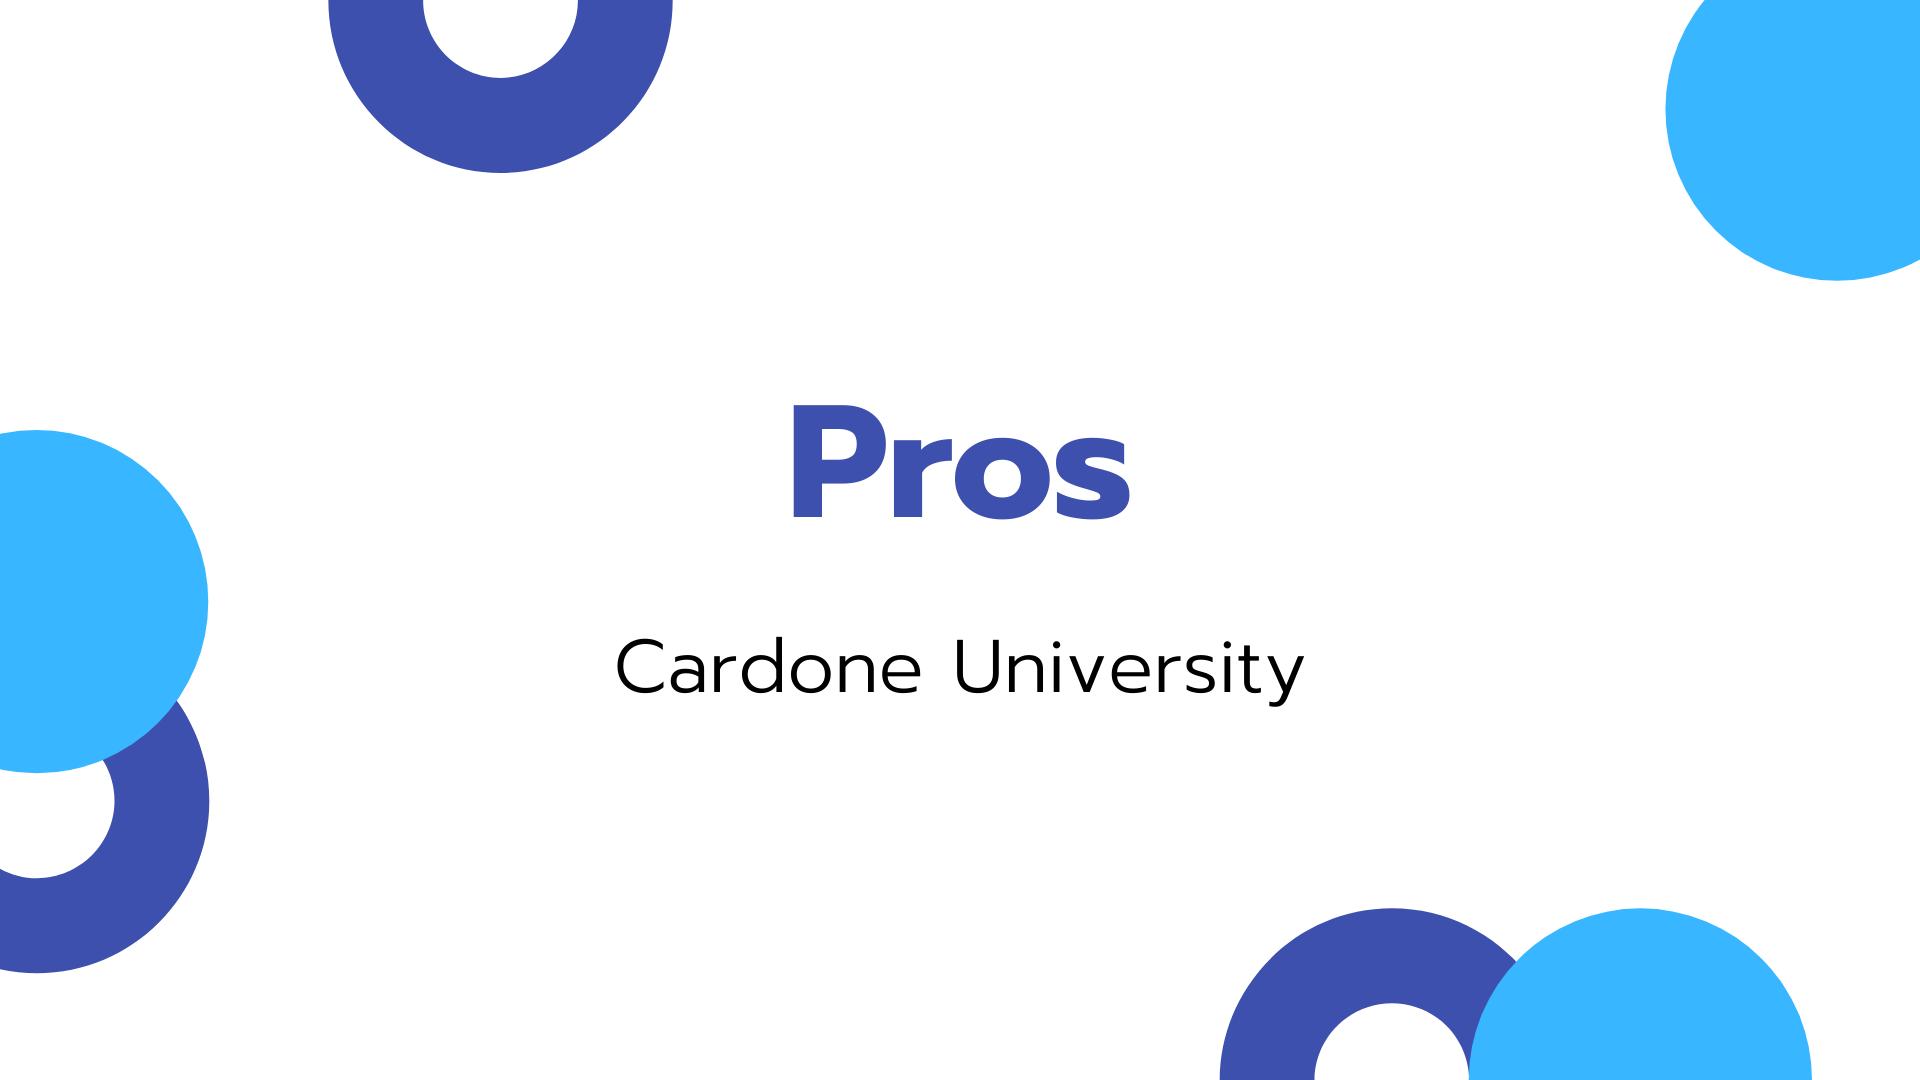 The pros of Cardone University